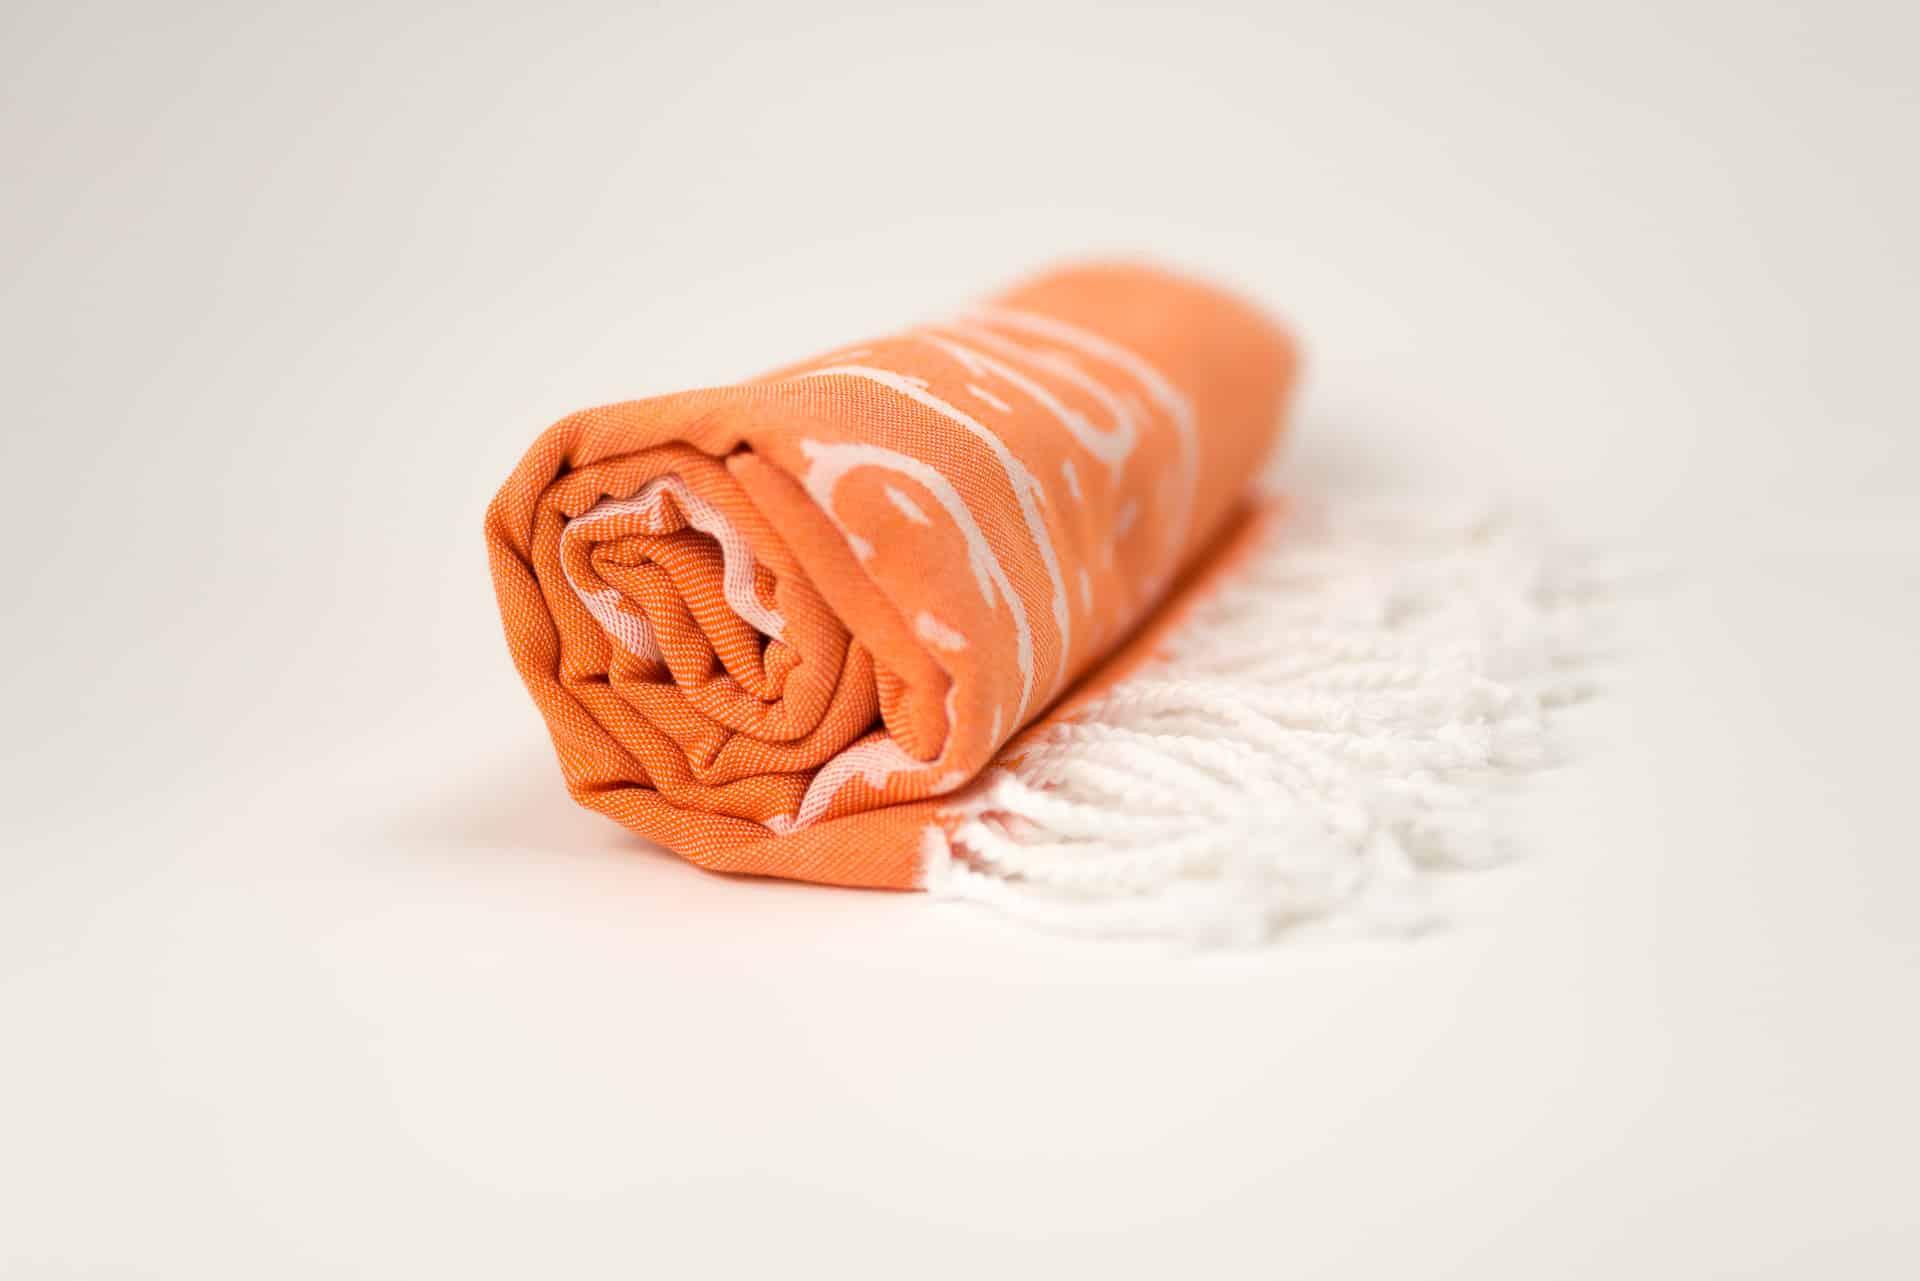 ORANGE-CACTUS-Towel-Lemonical-5